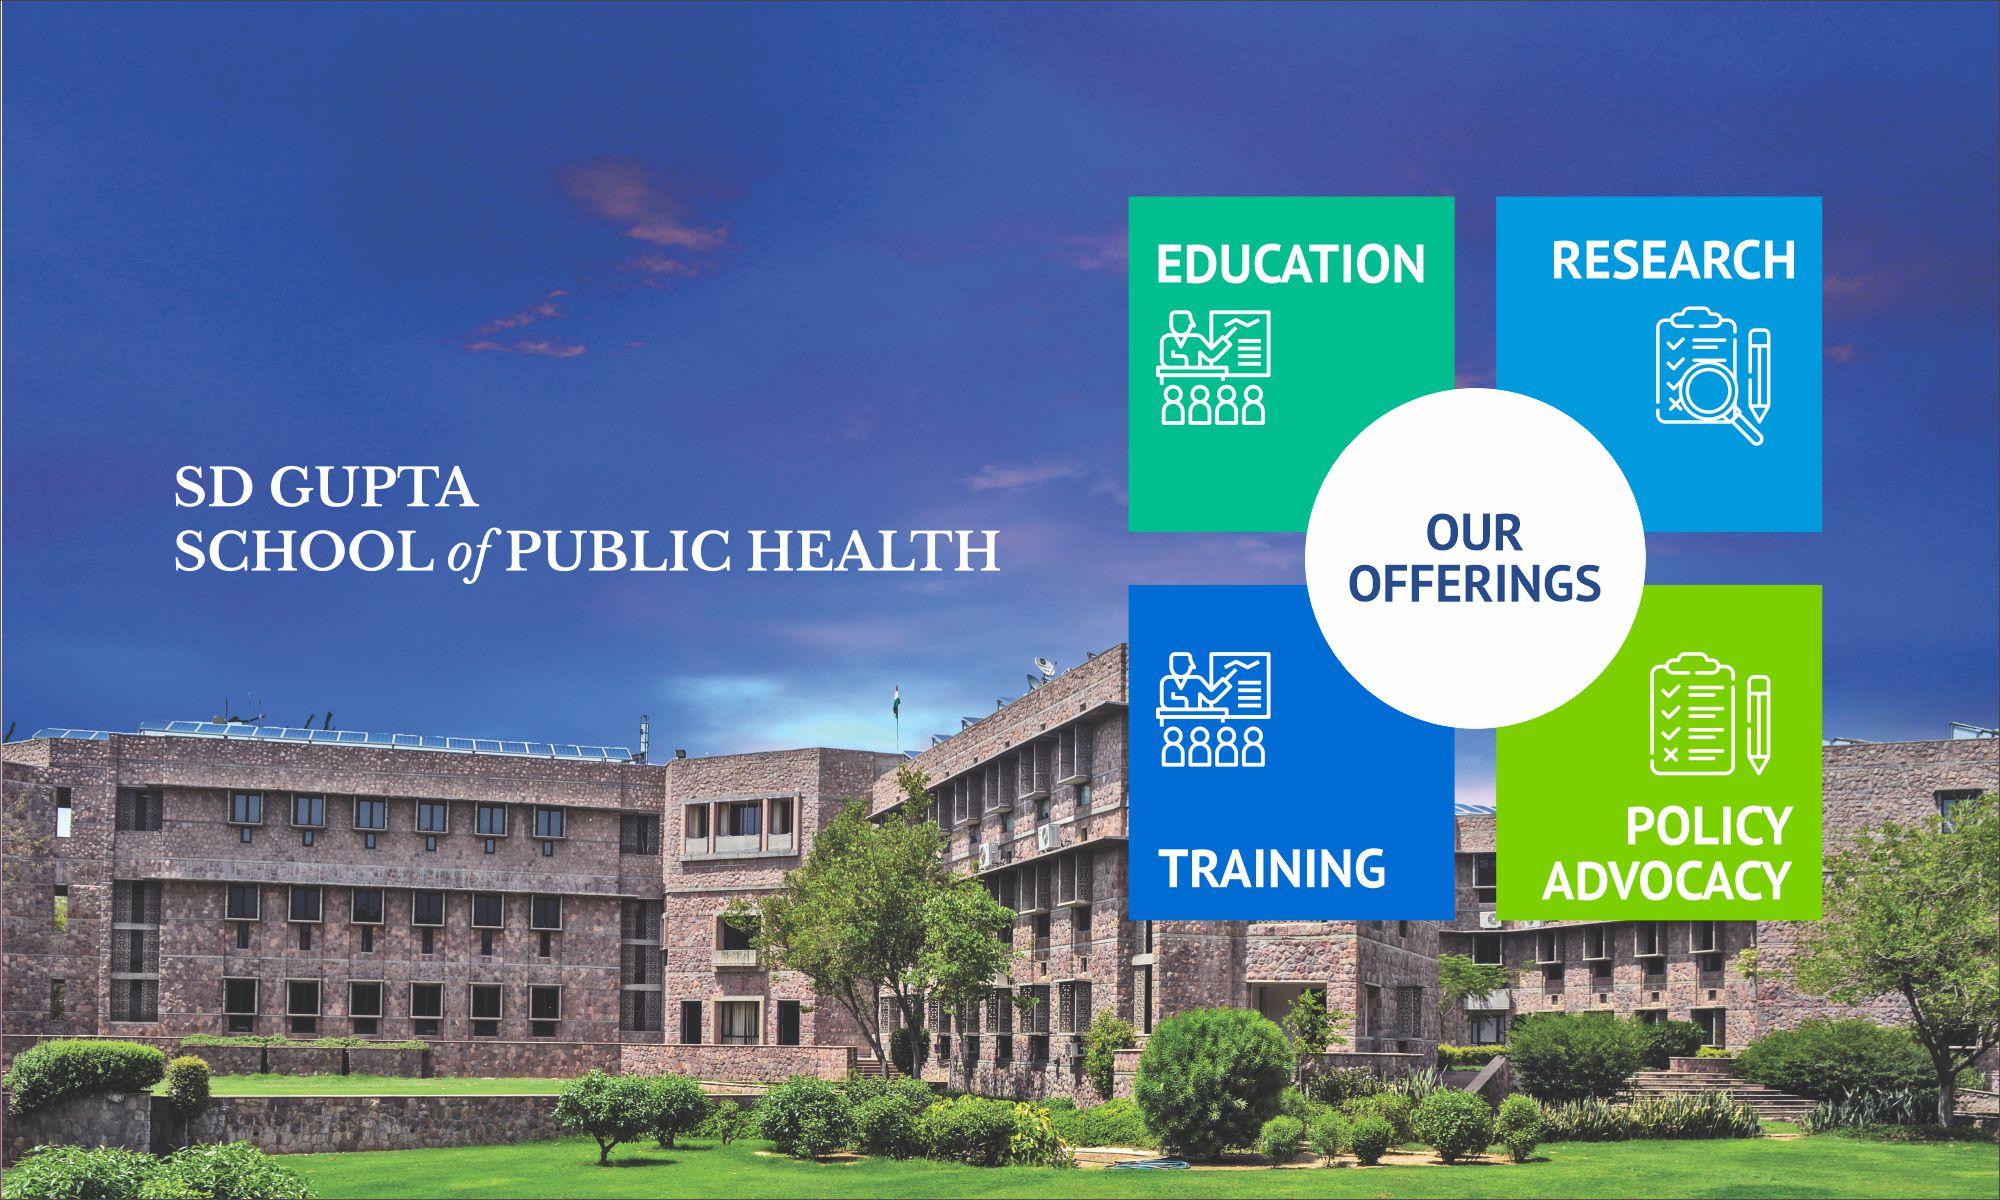 SD Gupta School of Public Health